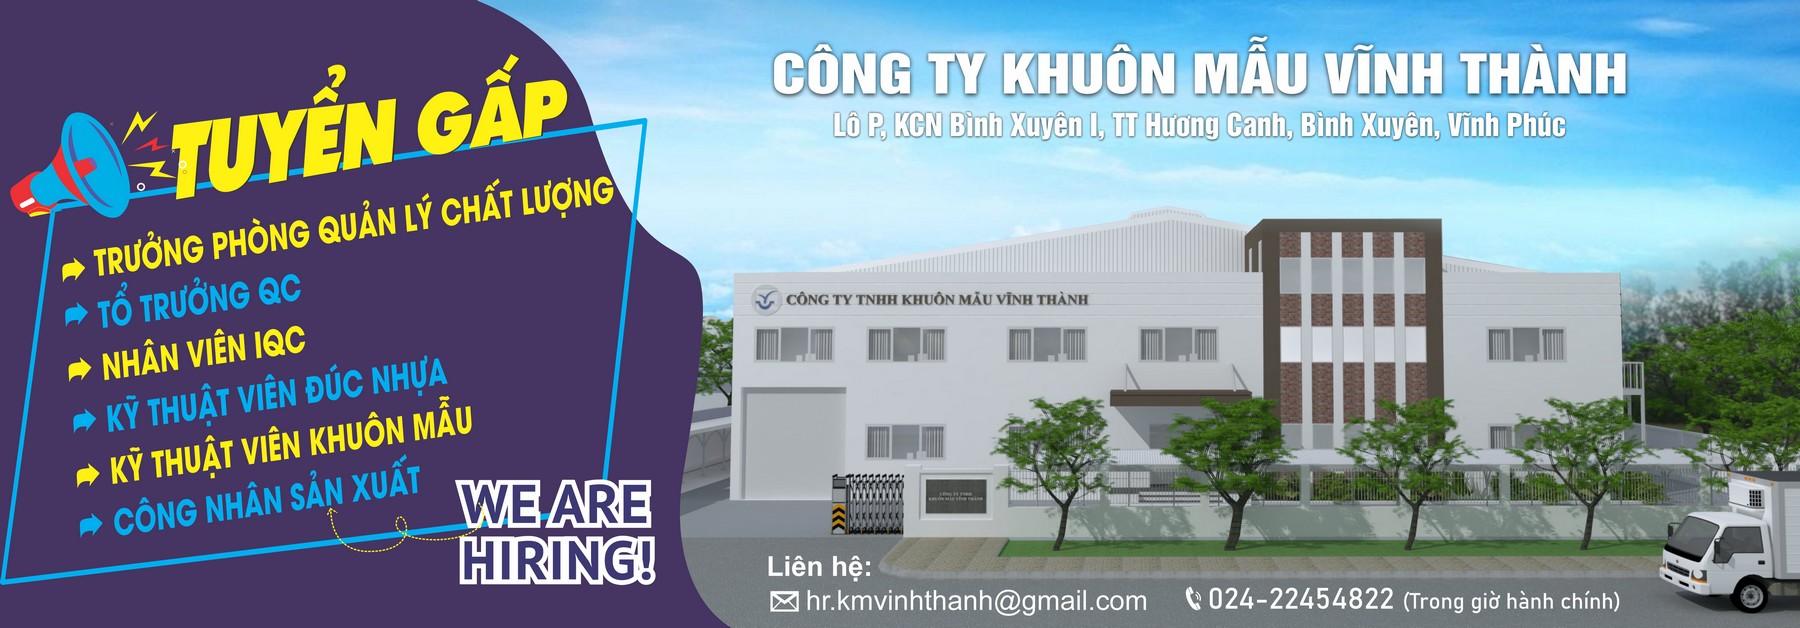 02banner Vinh Thanh 24 9 21